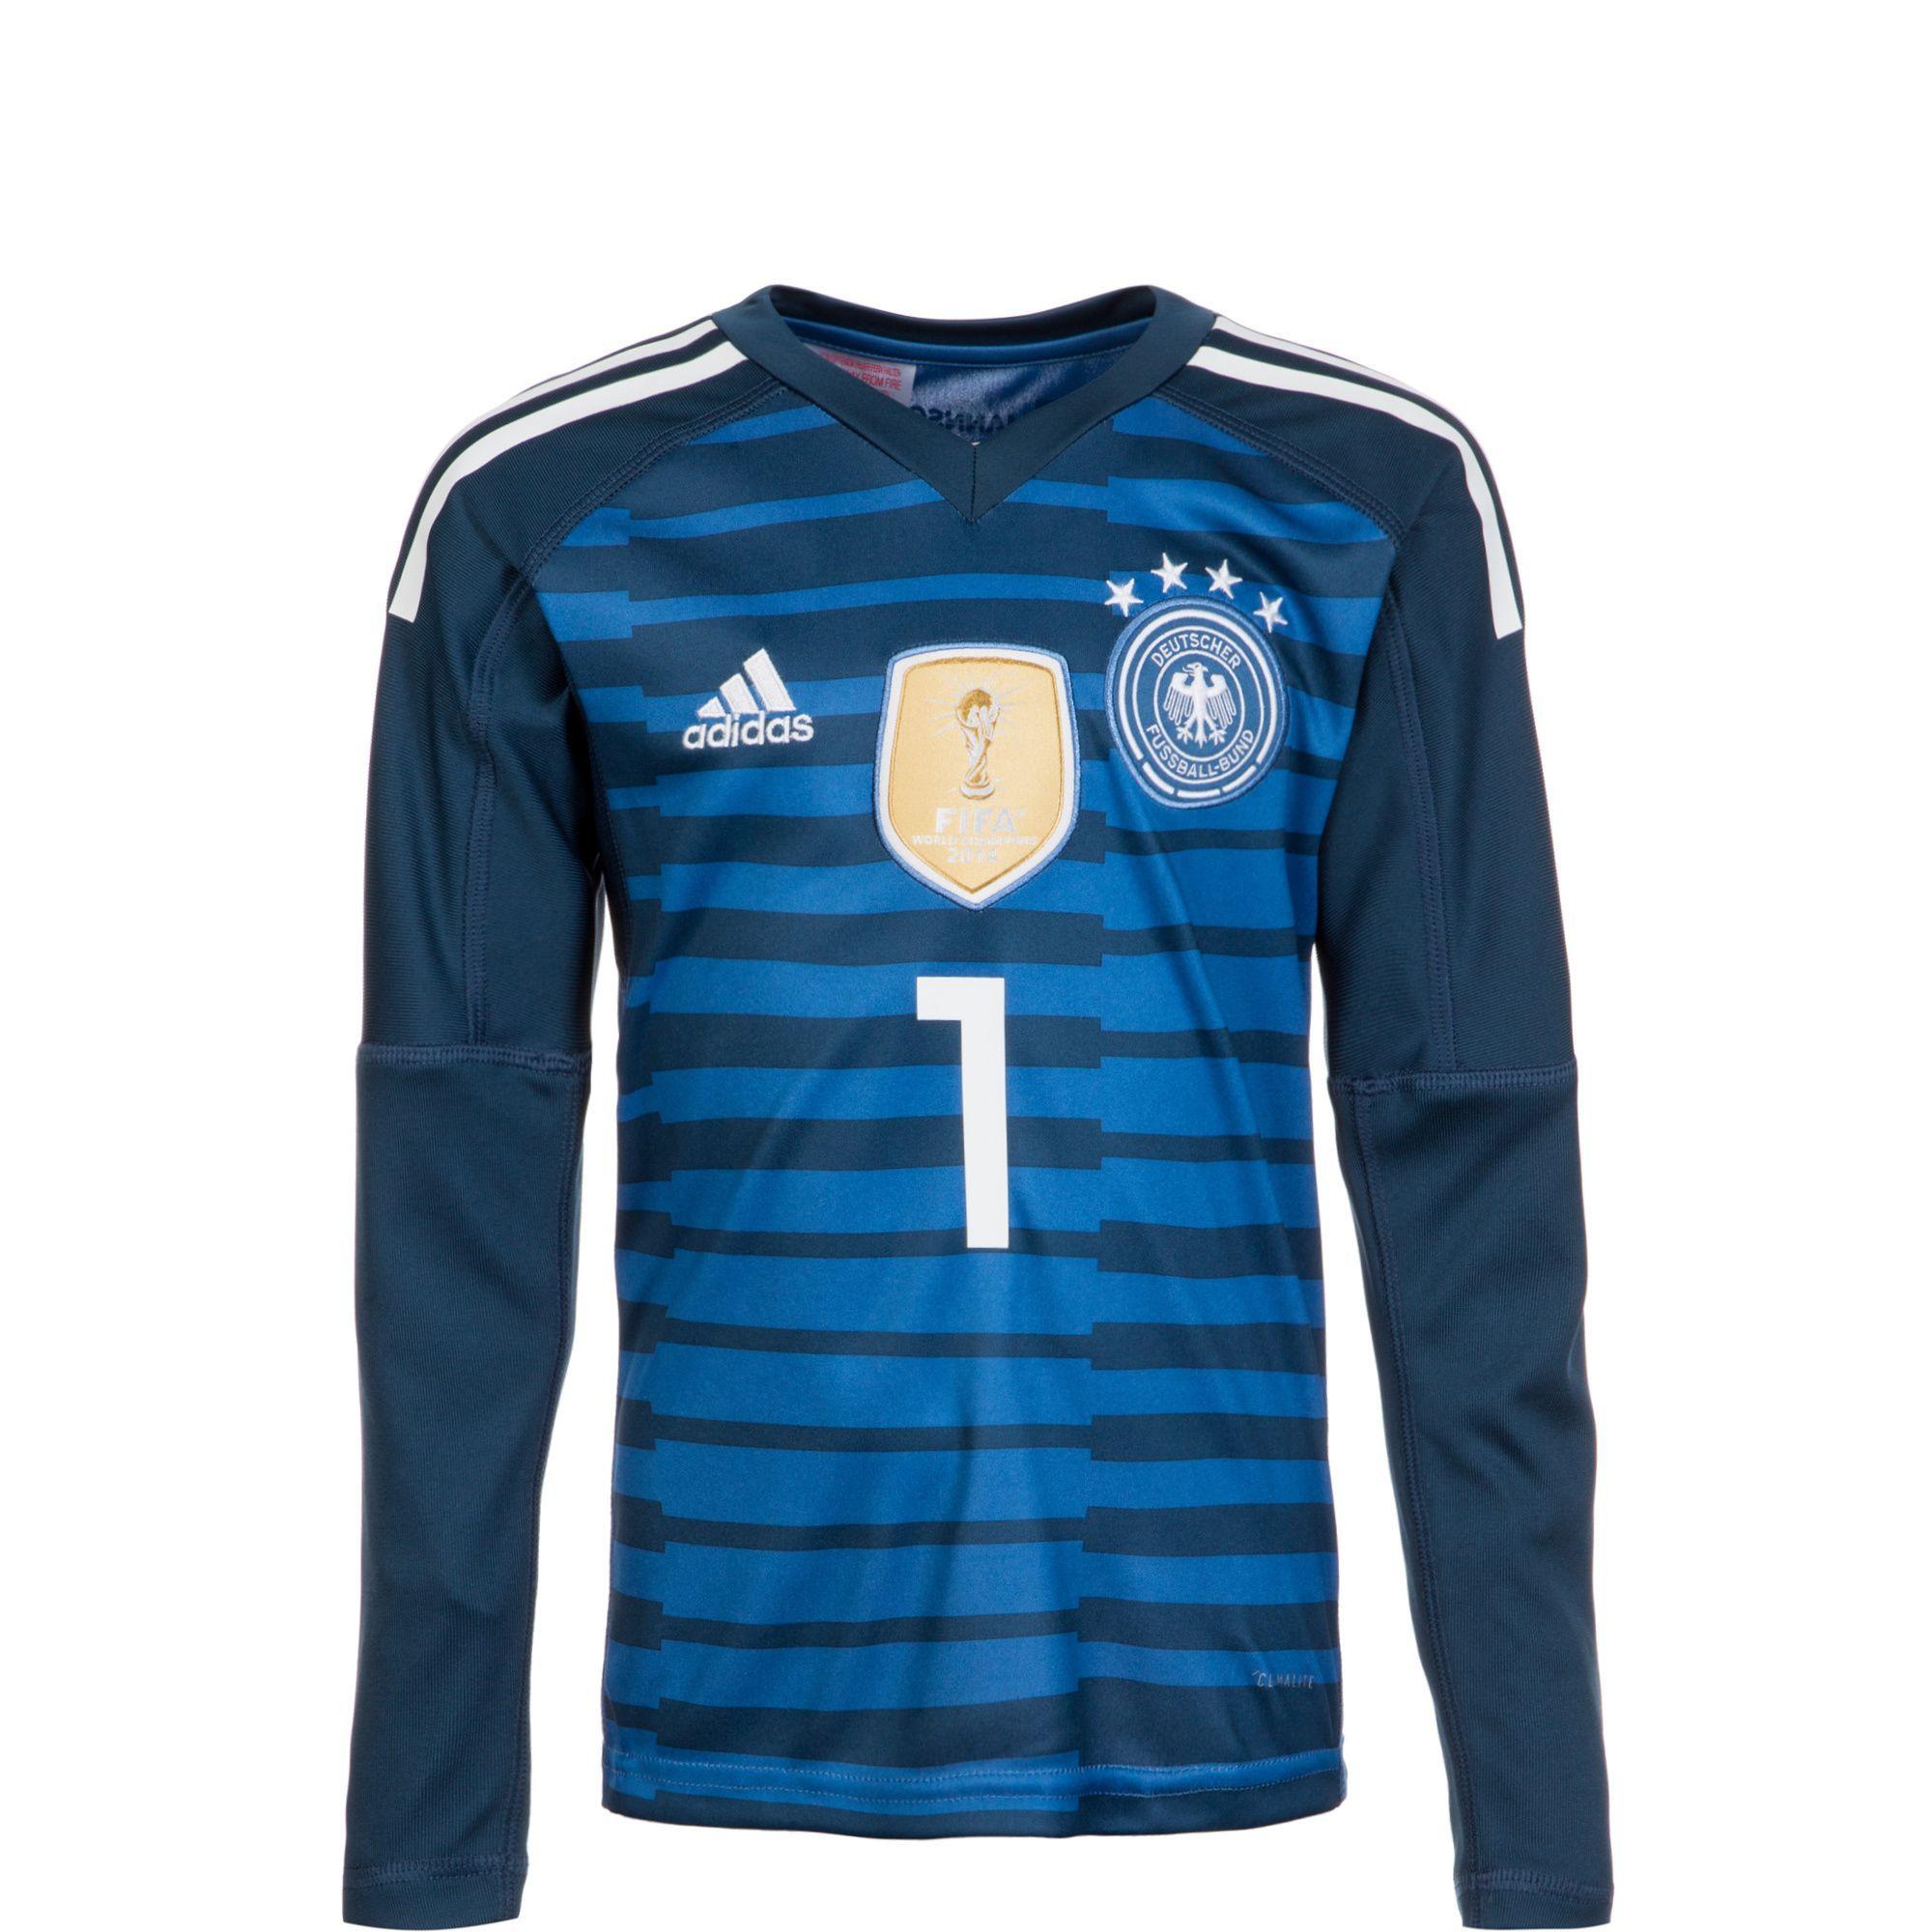 Torwarttrikot DFB Torwart Trikot Neuer Wm 2018 Heim #WM